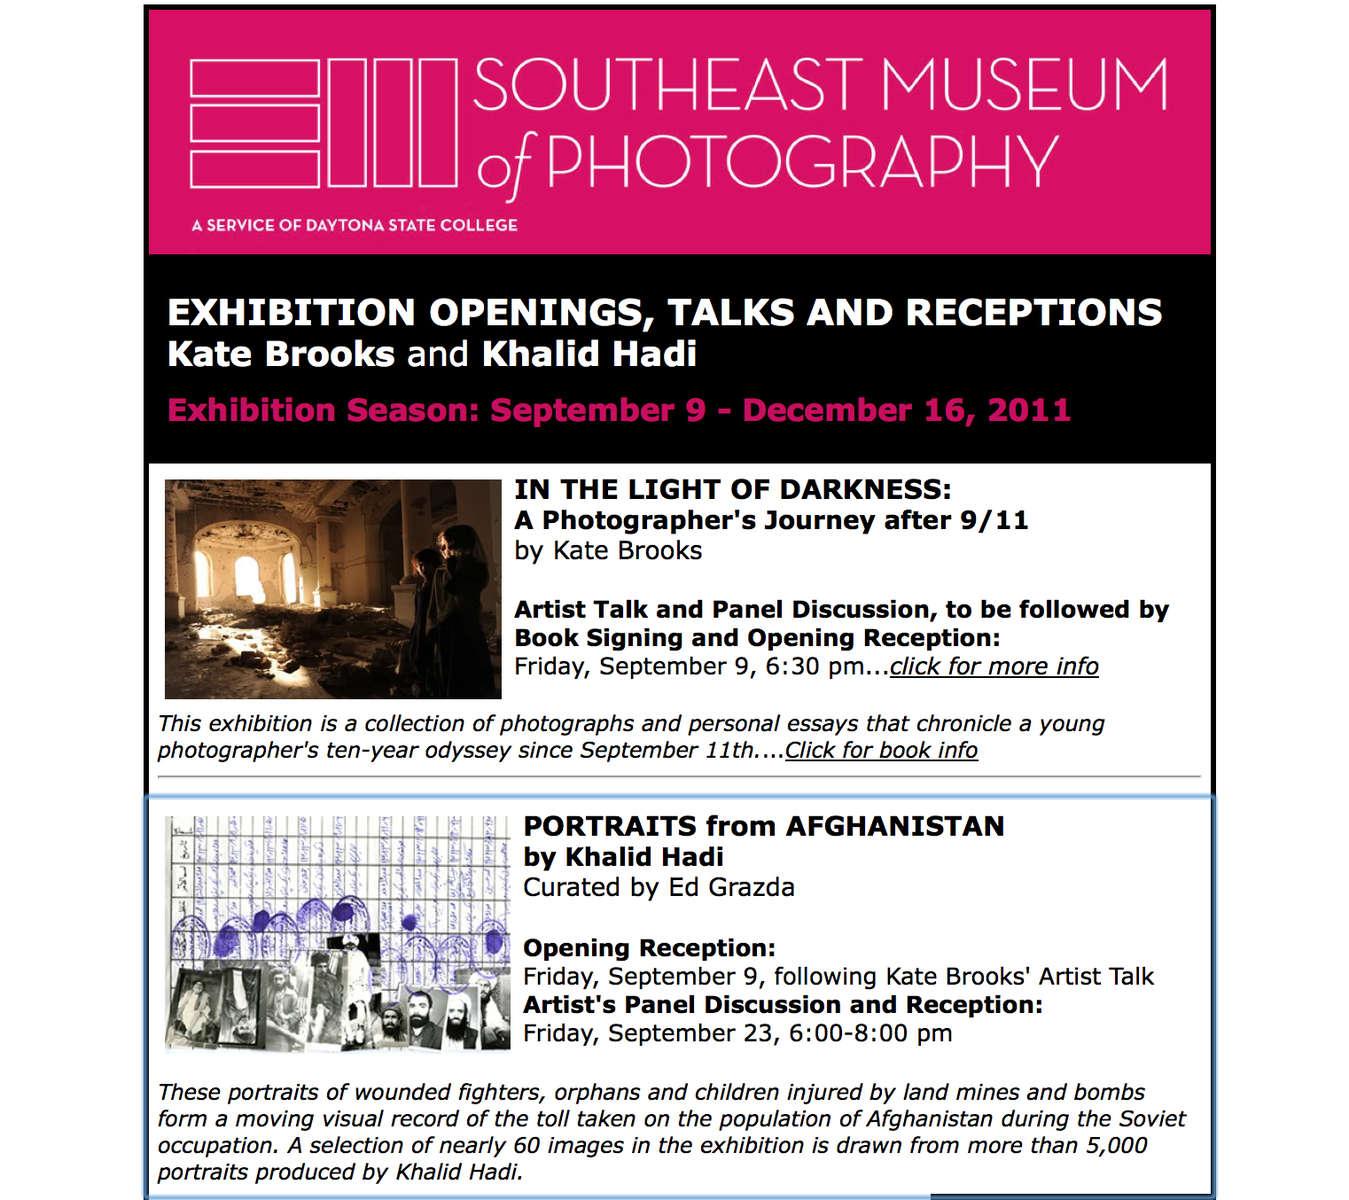 southeastmuseum